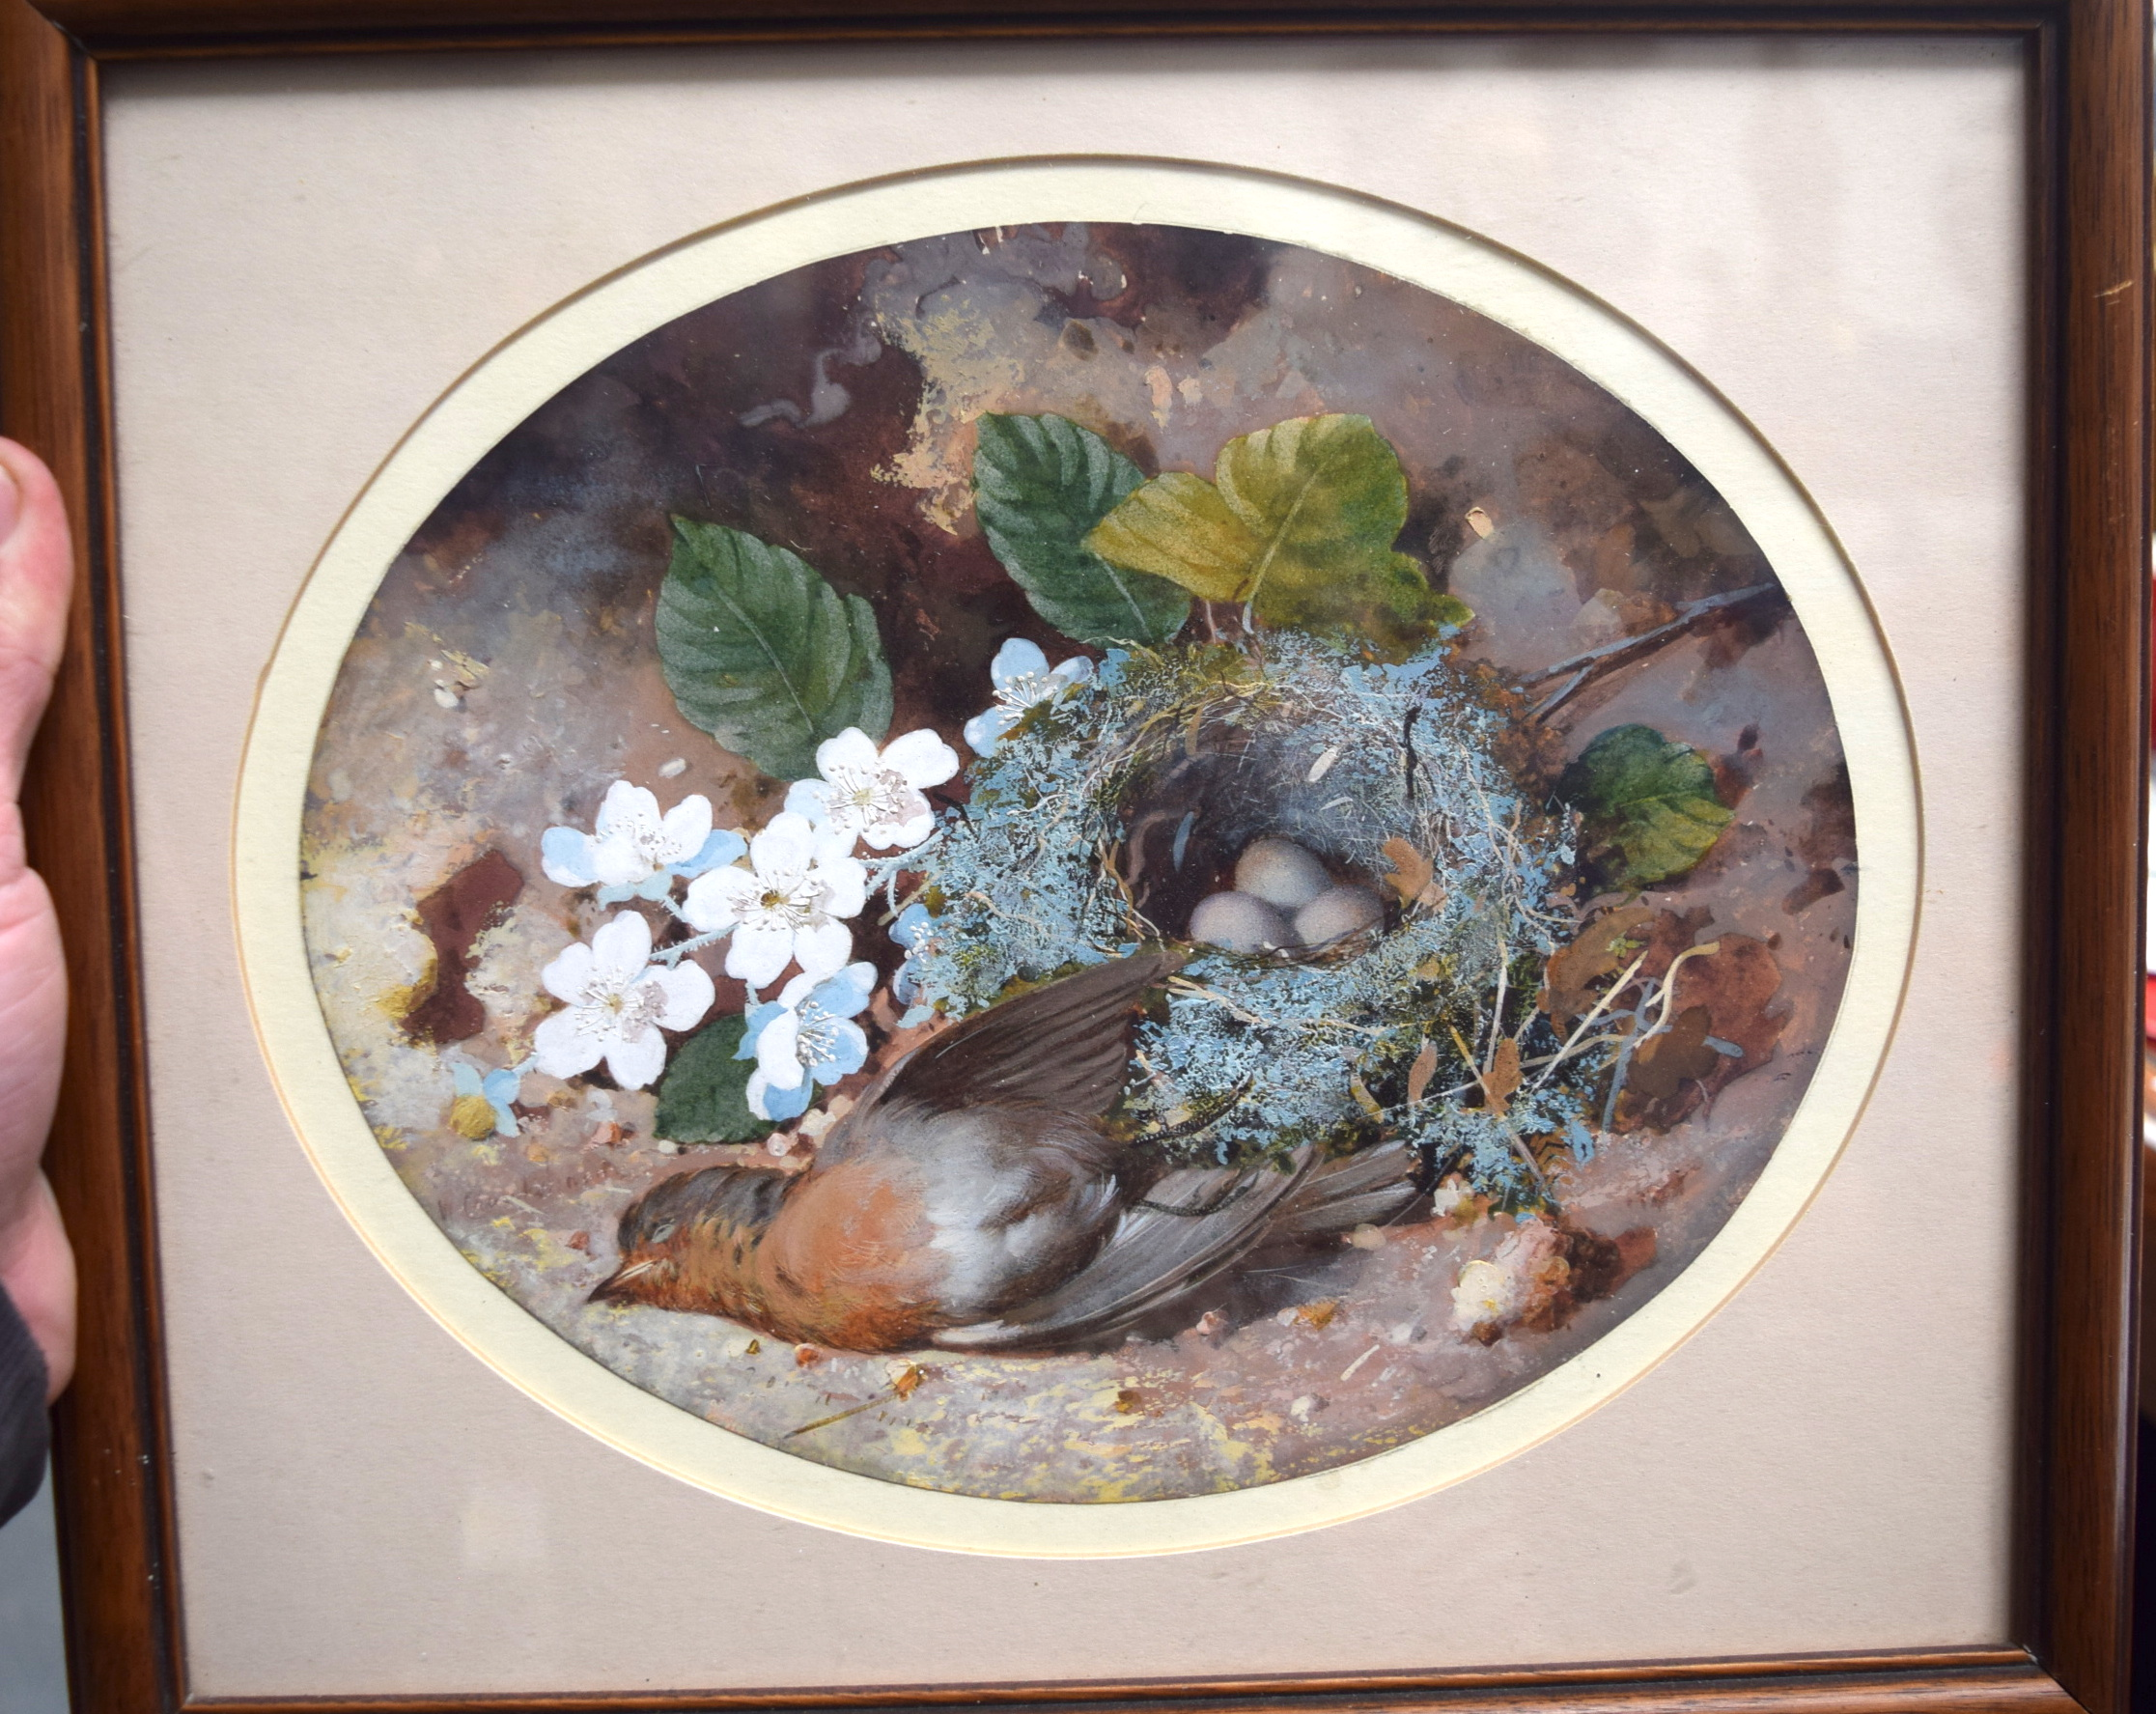 Lot 2917 - BRITISH SHCOOL (Early 20th century), study of a dead bird, 20 cm x 23.5 cm.